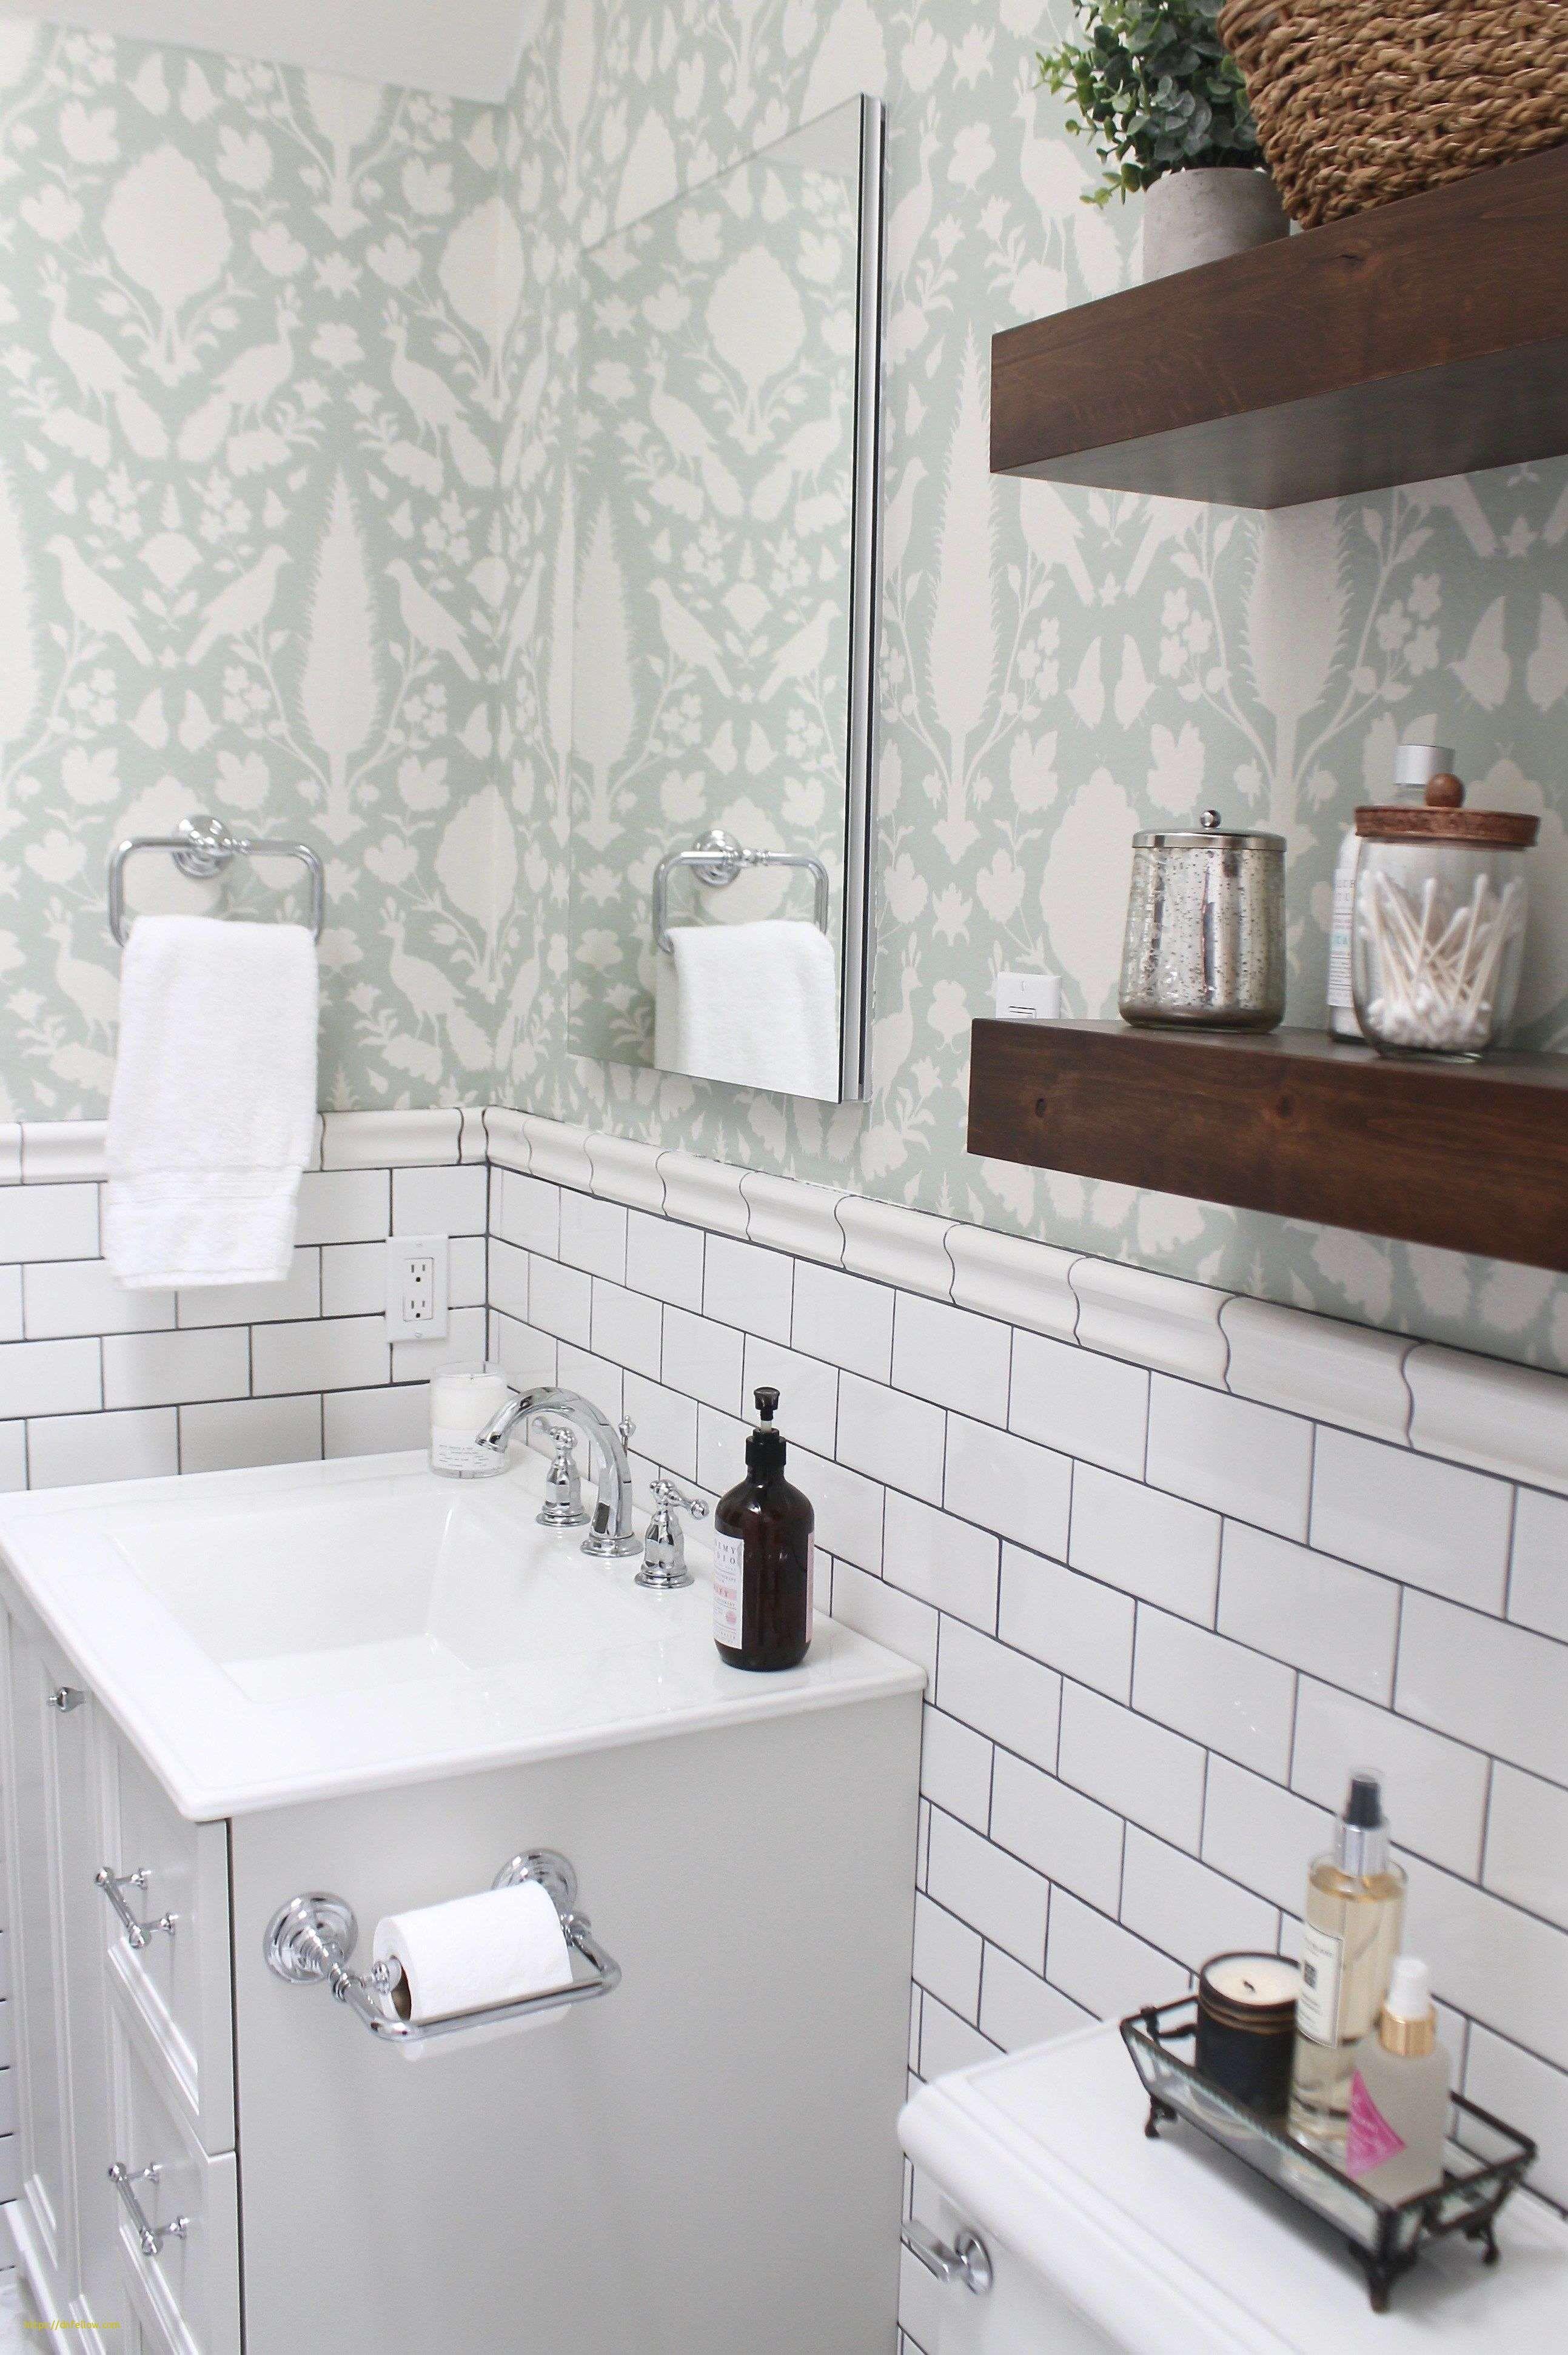 Awesome Bathroom Design 6x9 Awesome Bathroom Design 6x9 - Pleasant ...